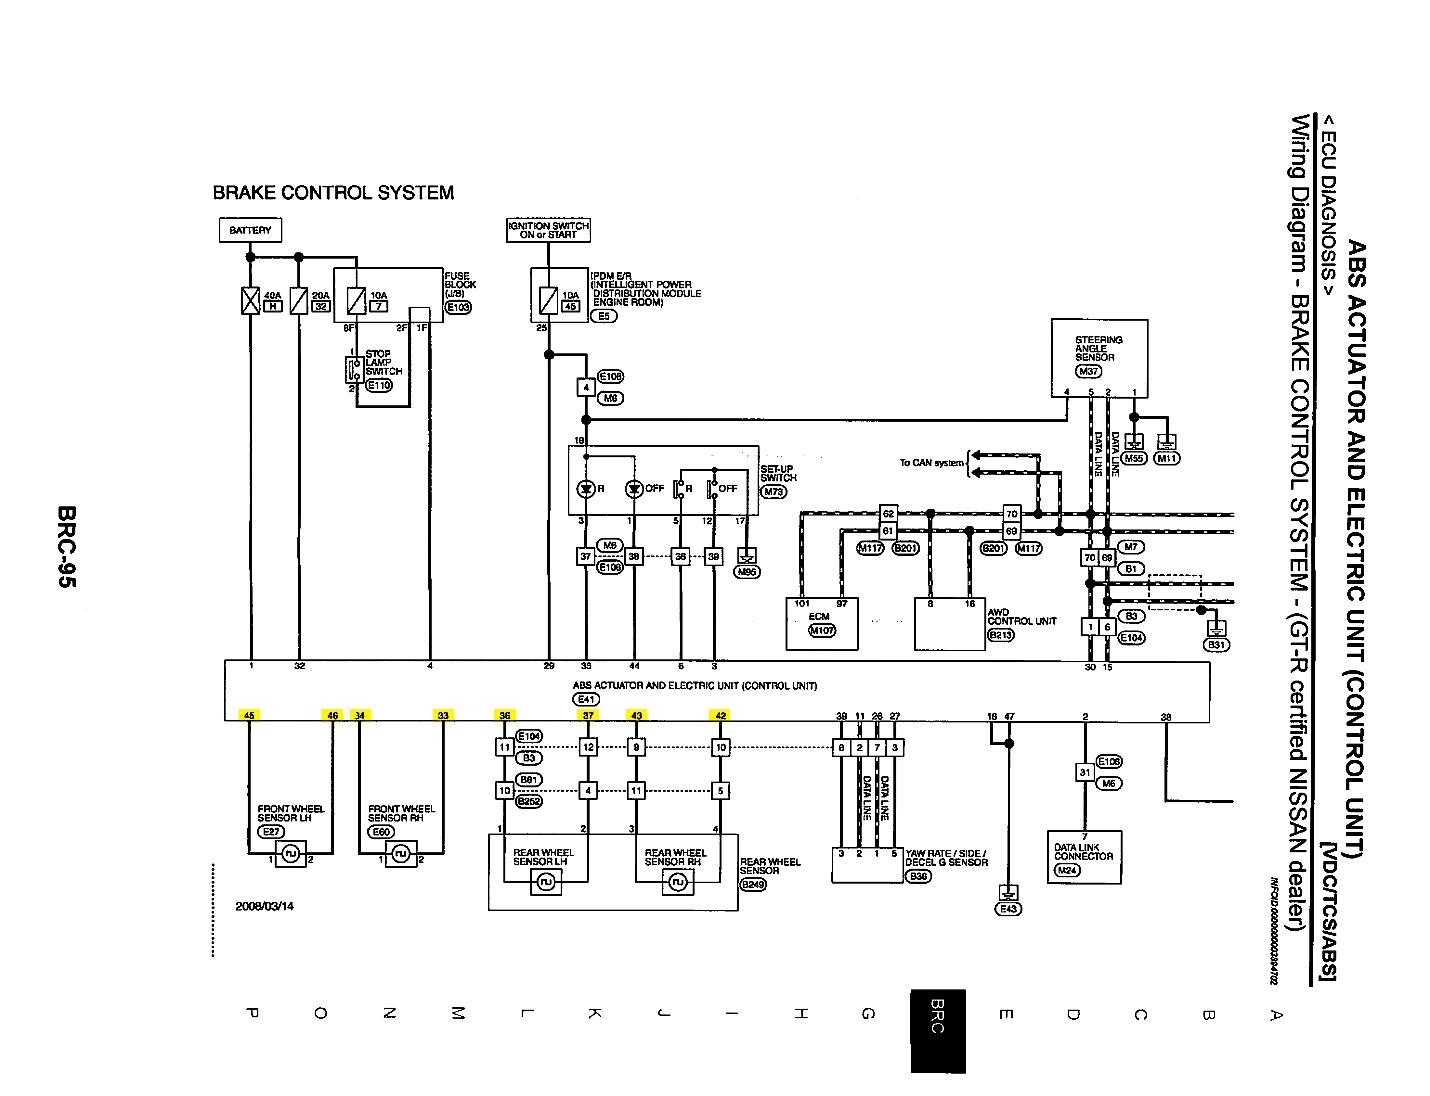 Diagram, schematic  Description automatically generated